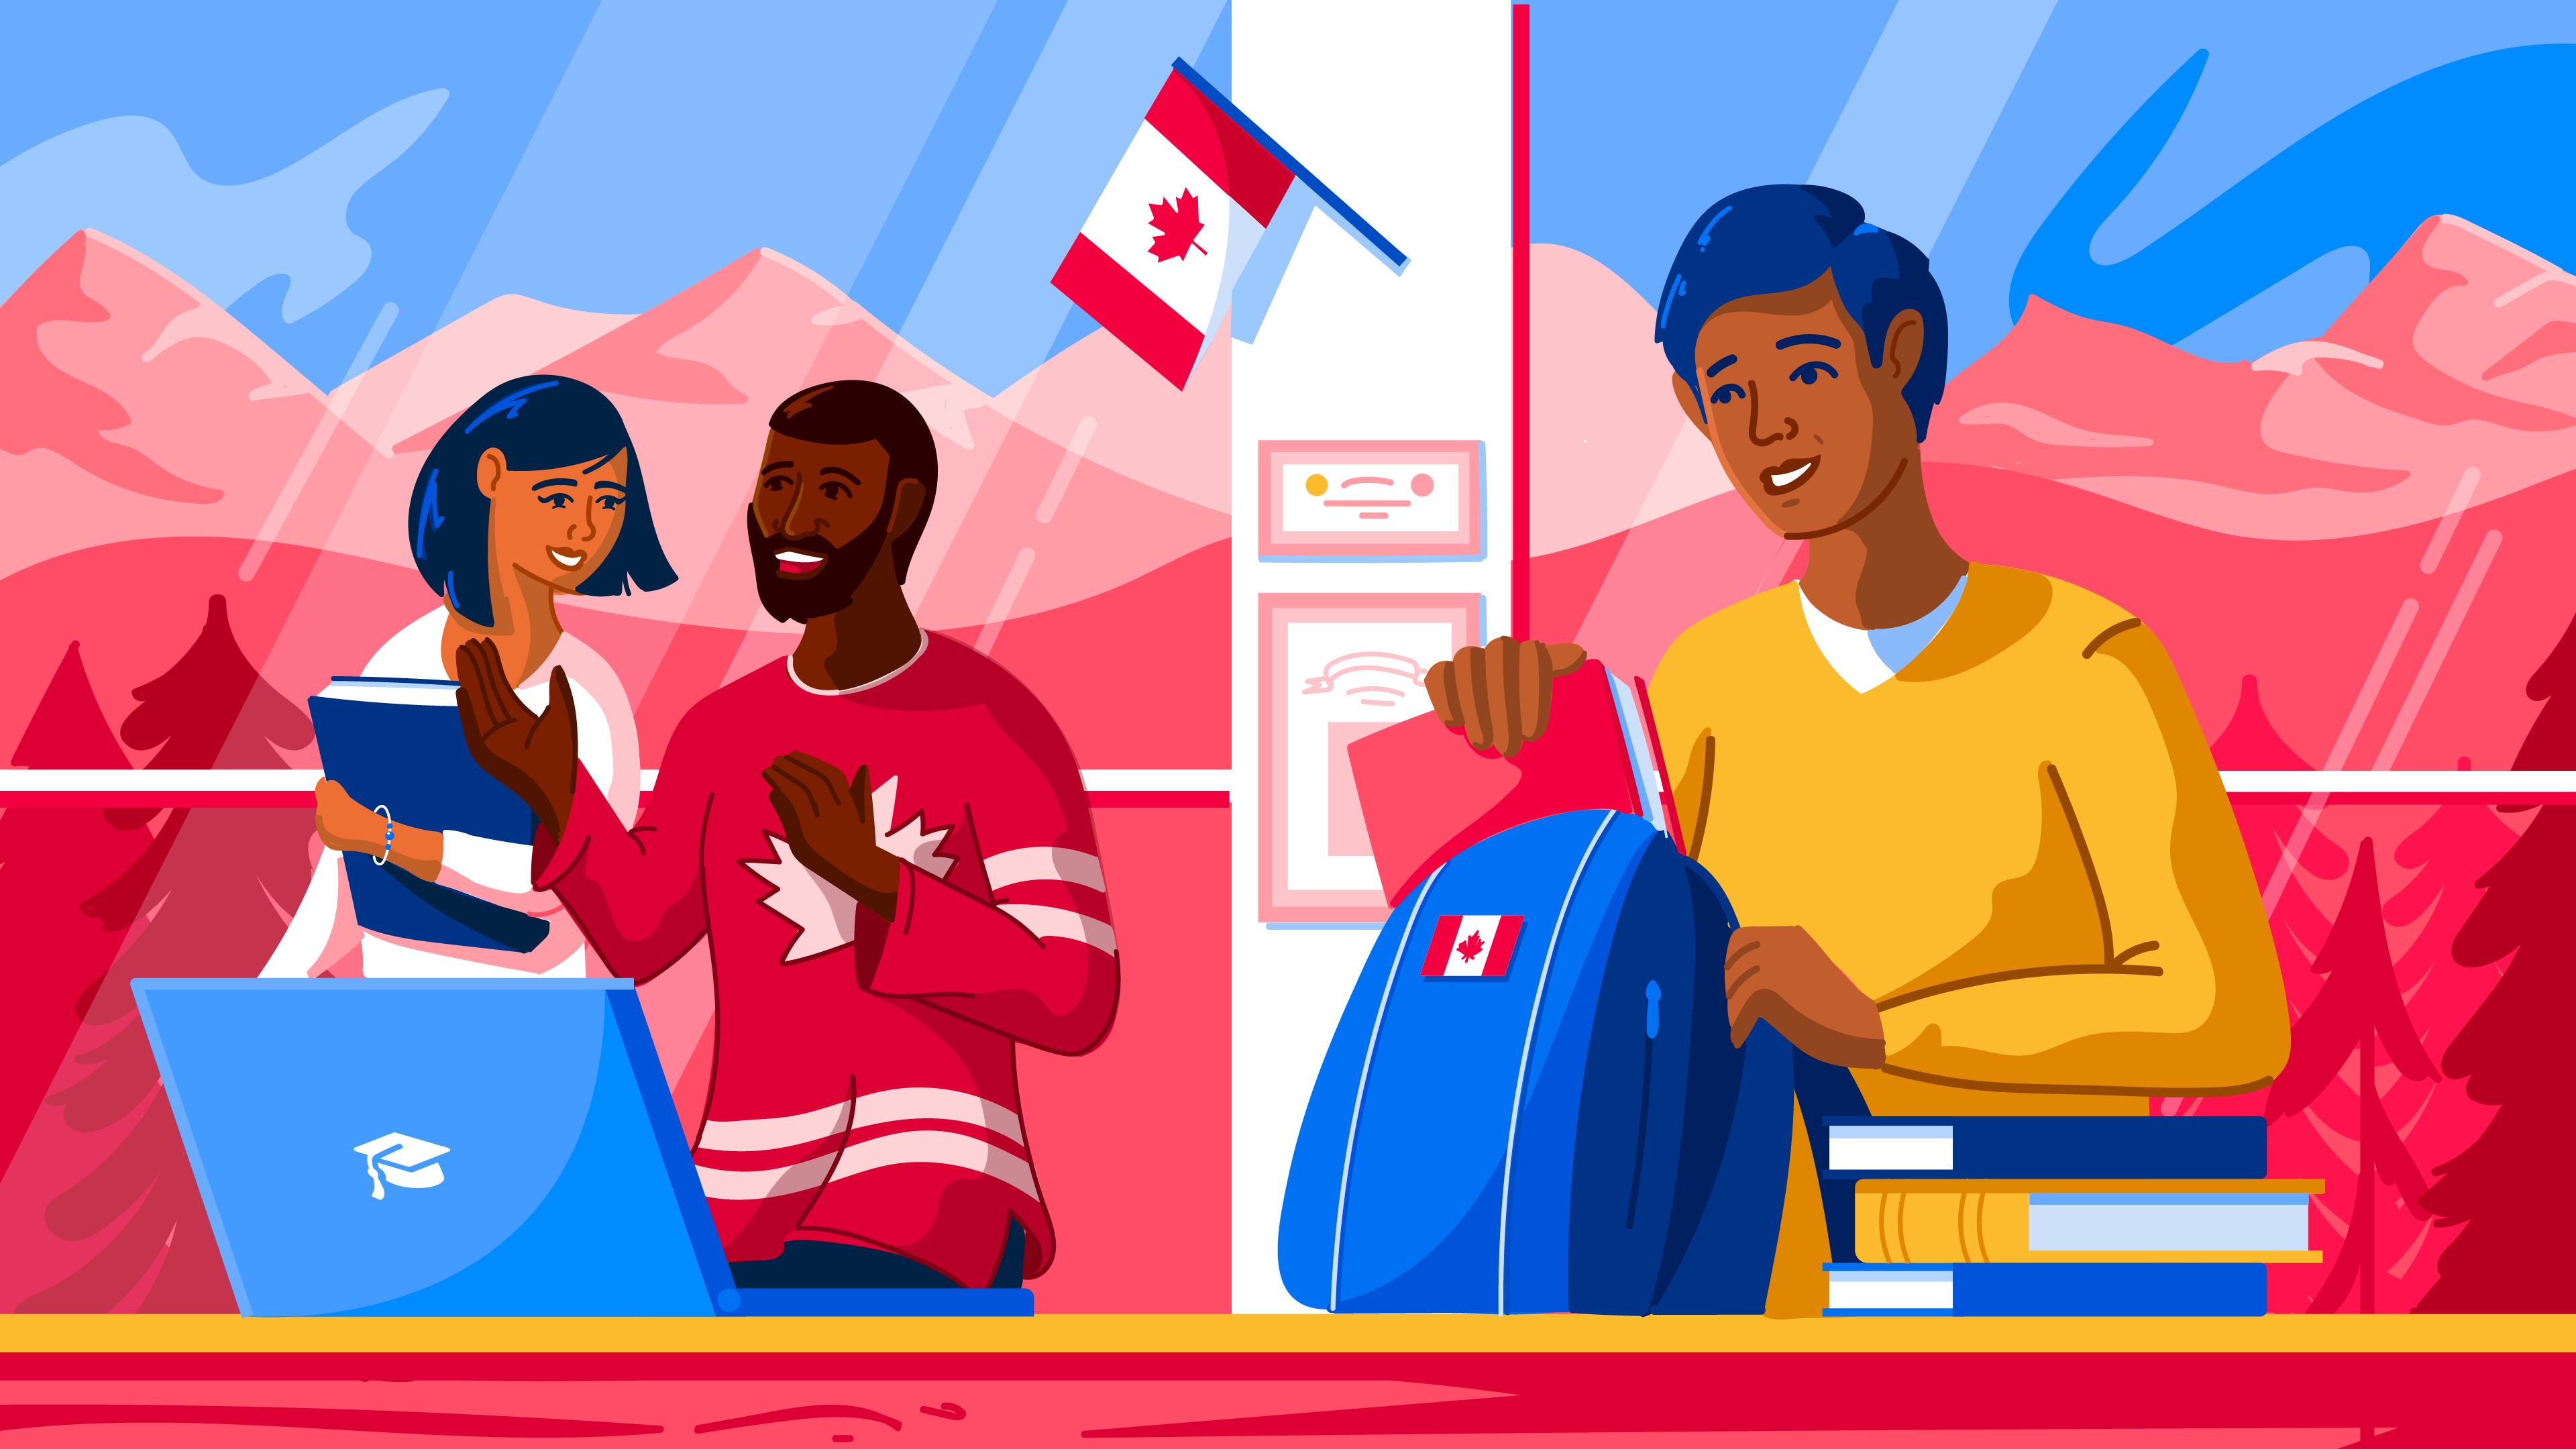 Maclean's Canadian University Rankings 2021 (Part 2)